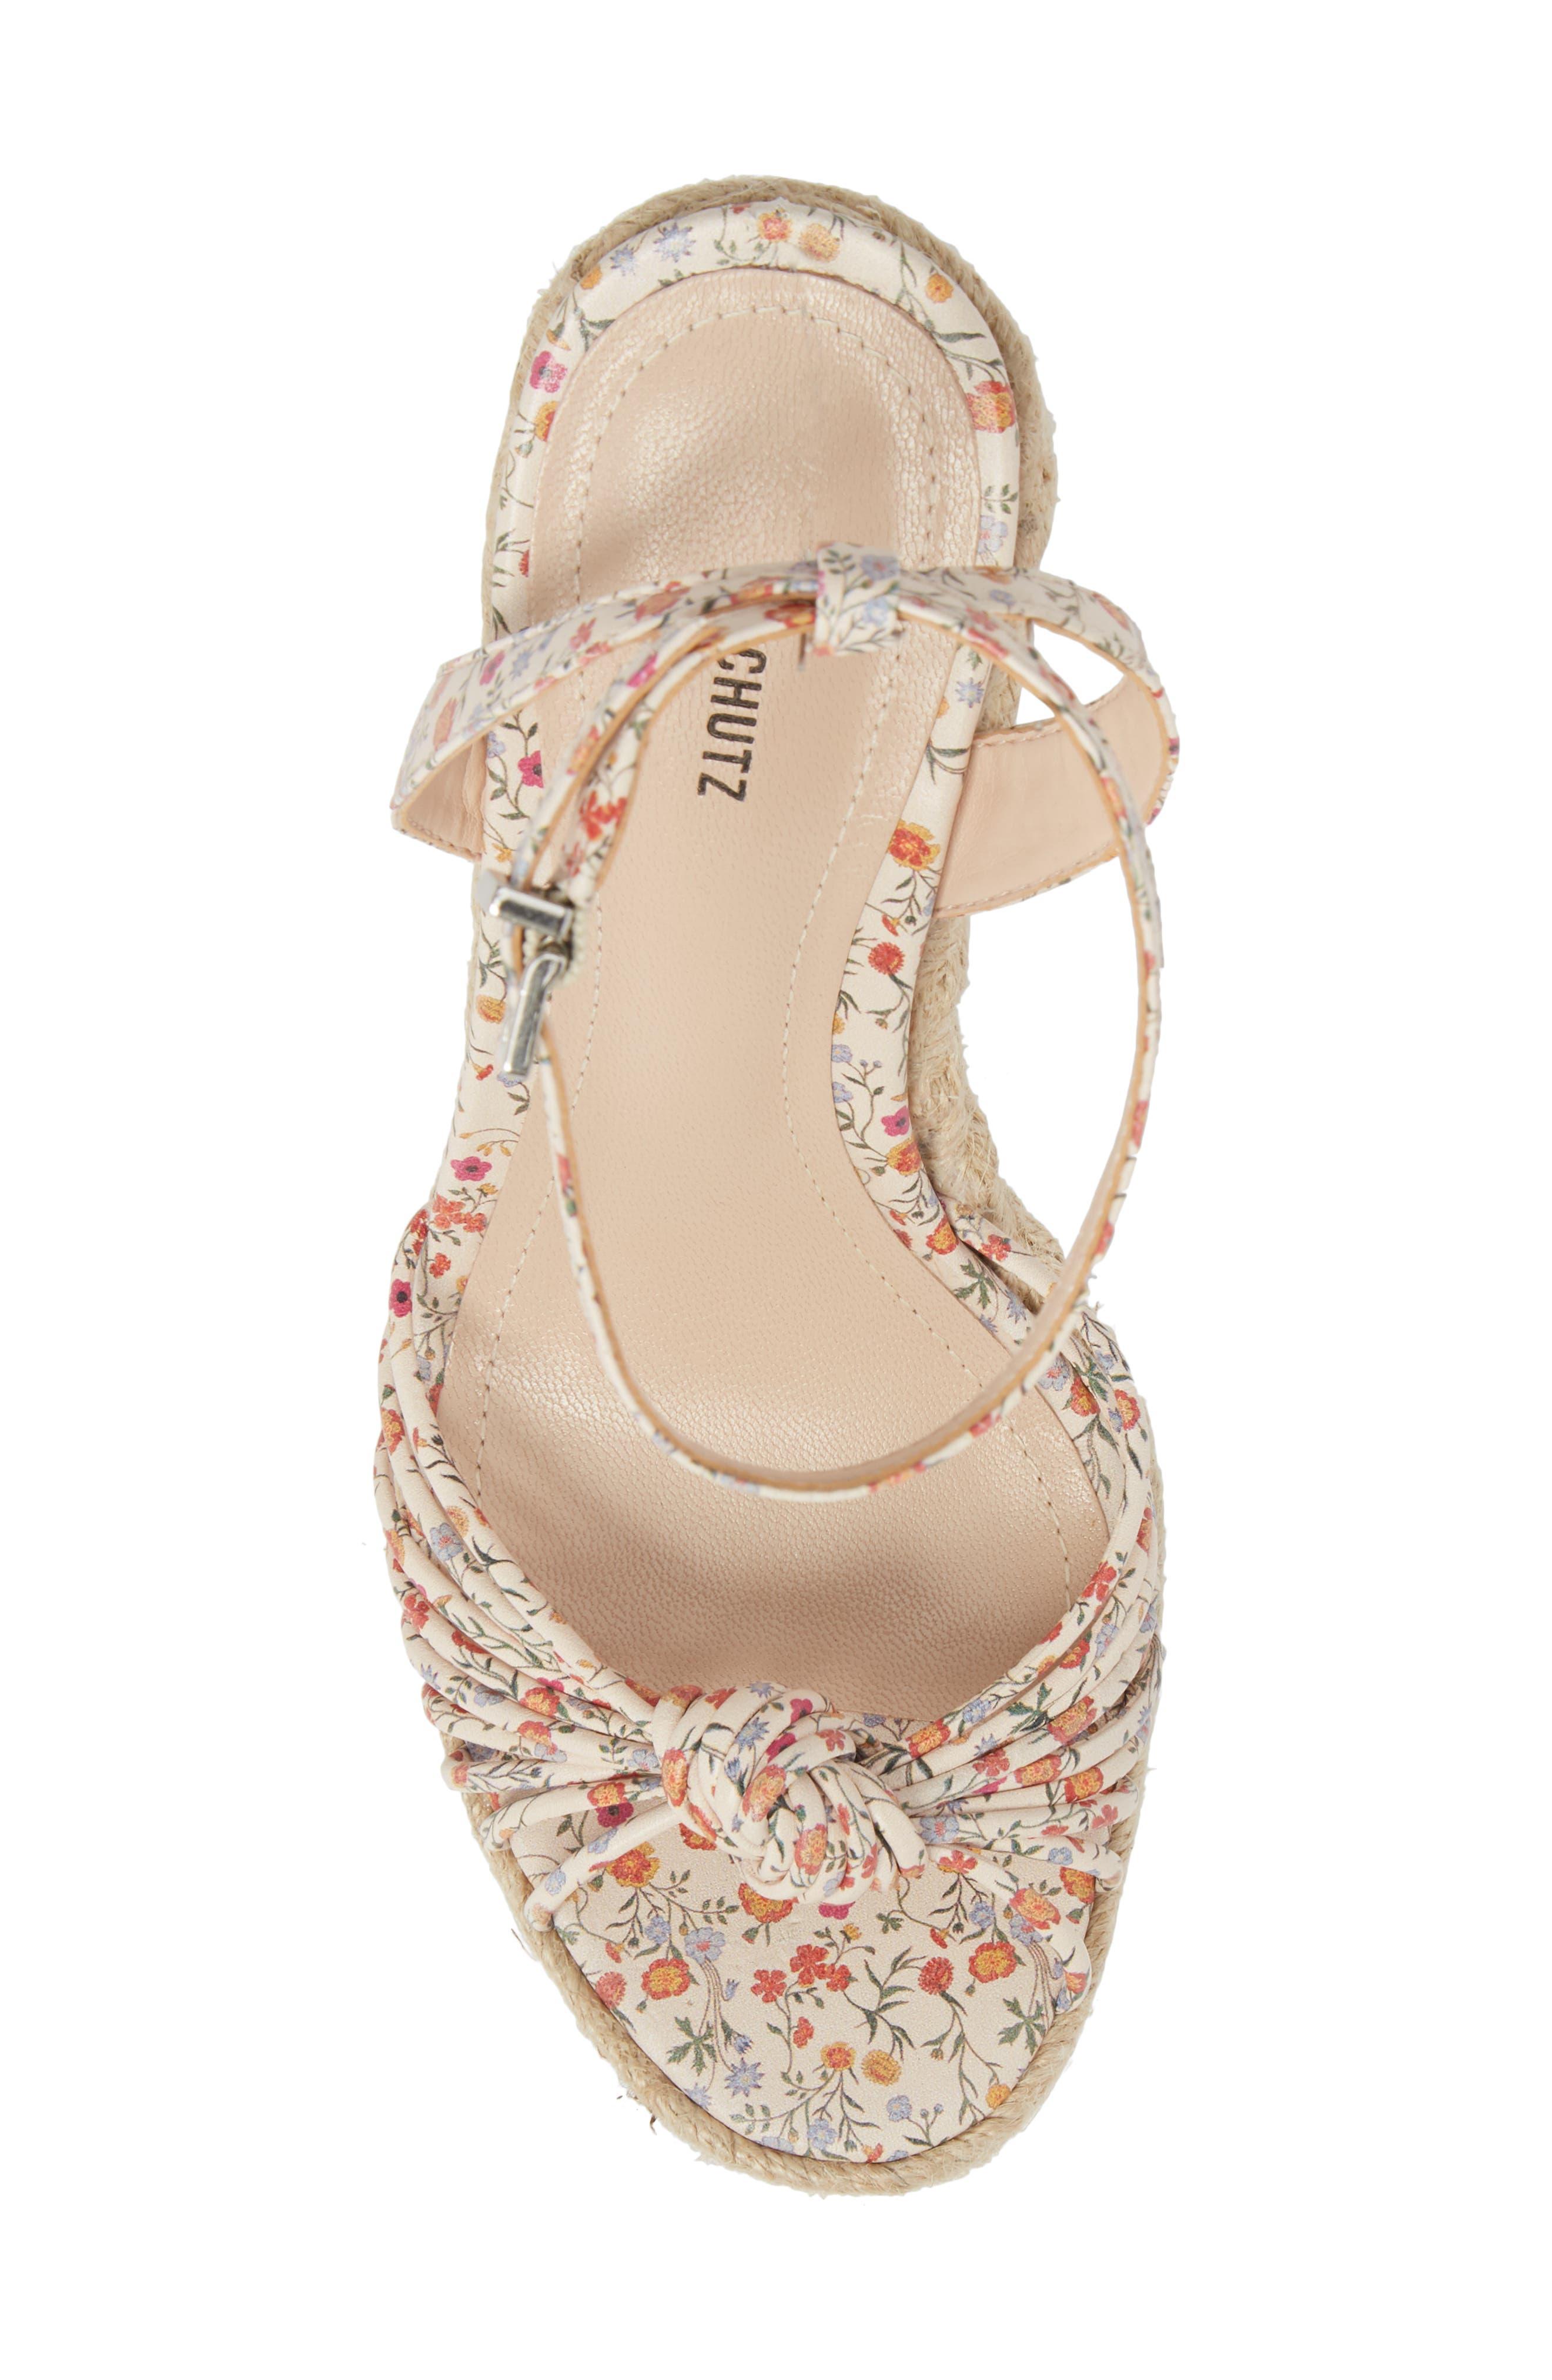 SCHUTZ, Gianne Platform Wedge Sandal, Alternate thumbnail 5, color, FLORAL LEATHER